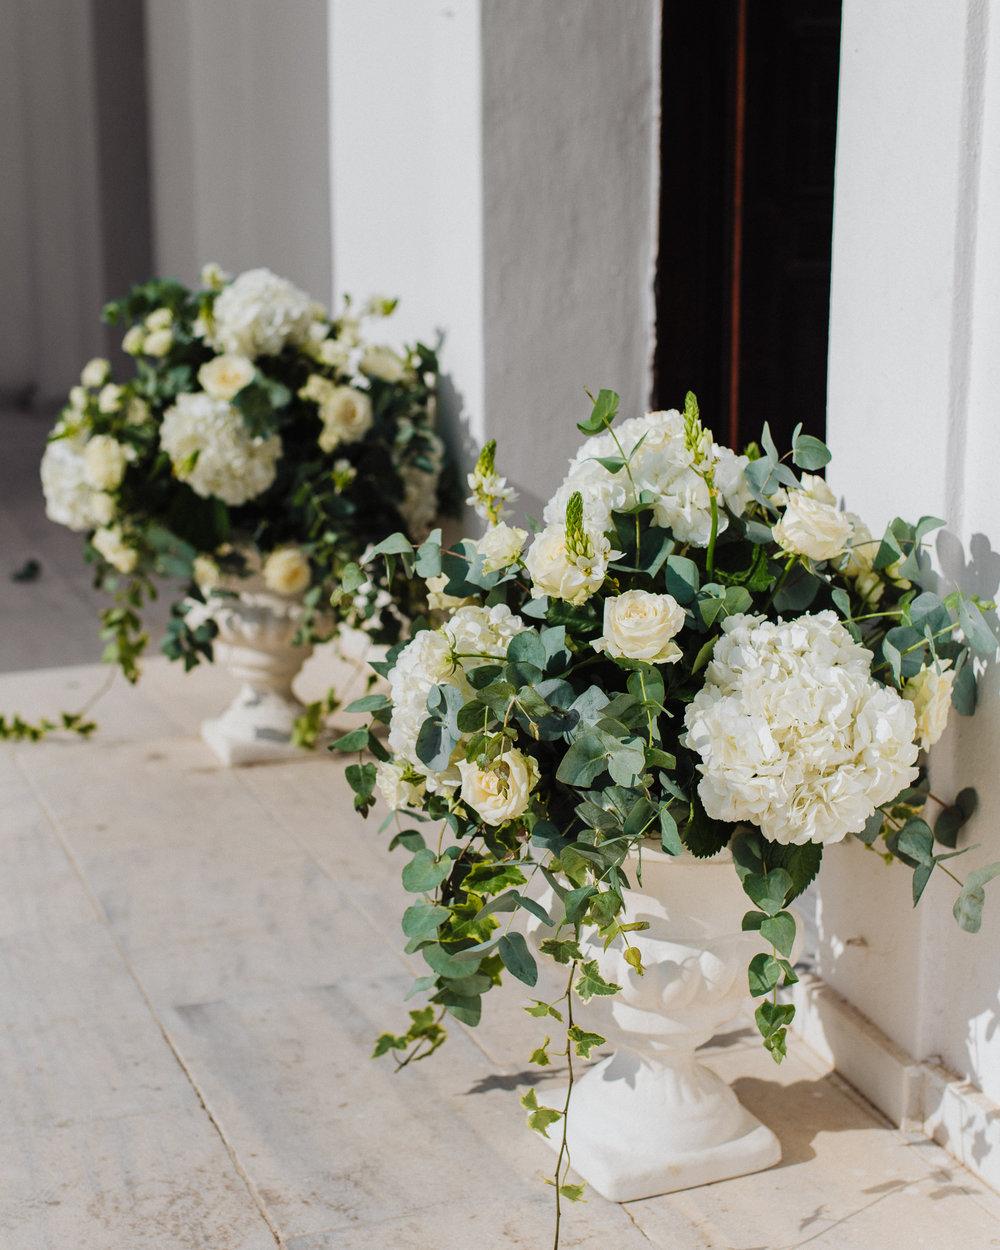 santorini-island-greece-wedding-celebration-bridal-groom-bride-dinner-sunset-rocabella-hotel-silkentile-event-planning-firm